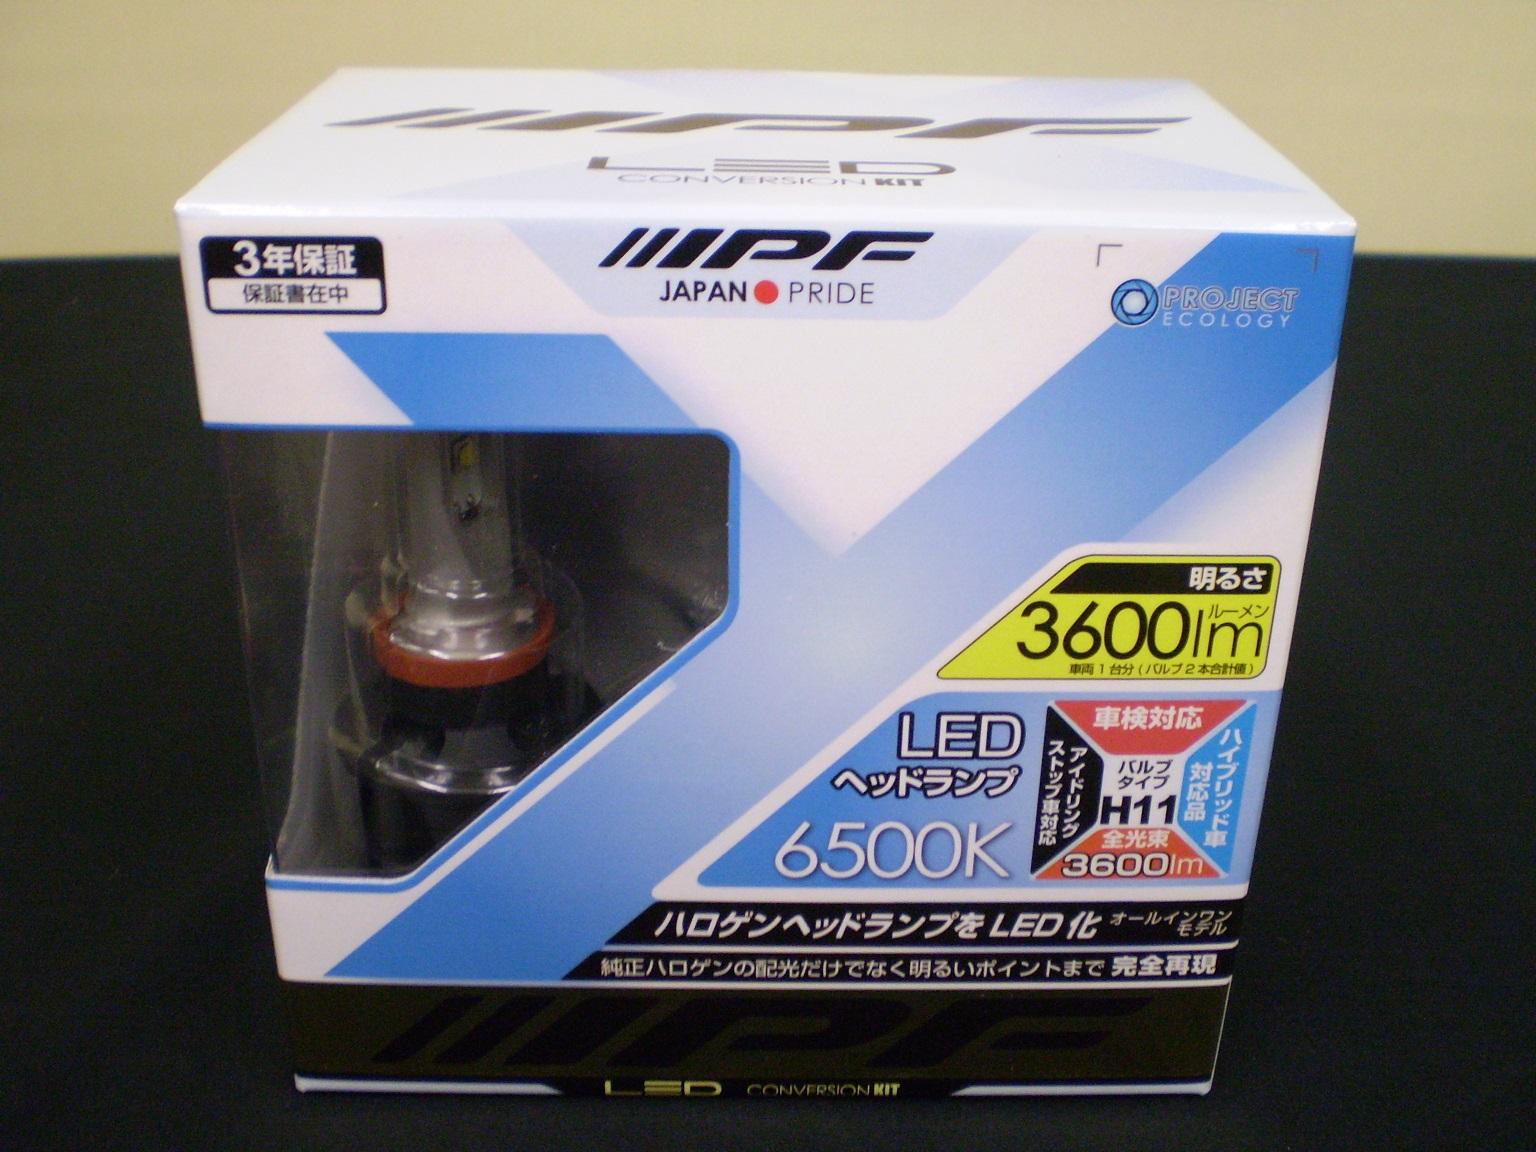 IPF LEDヘッドライト 6500K H11 301HLB 3600ルーメン 車検対応 3年保証 led ヘッドライト 【 02P05Nov16 】